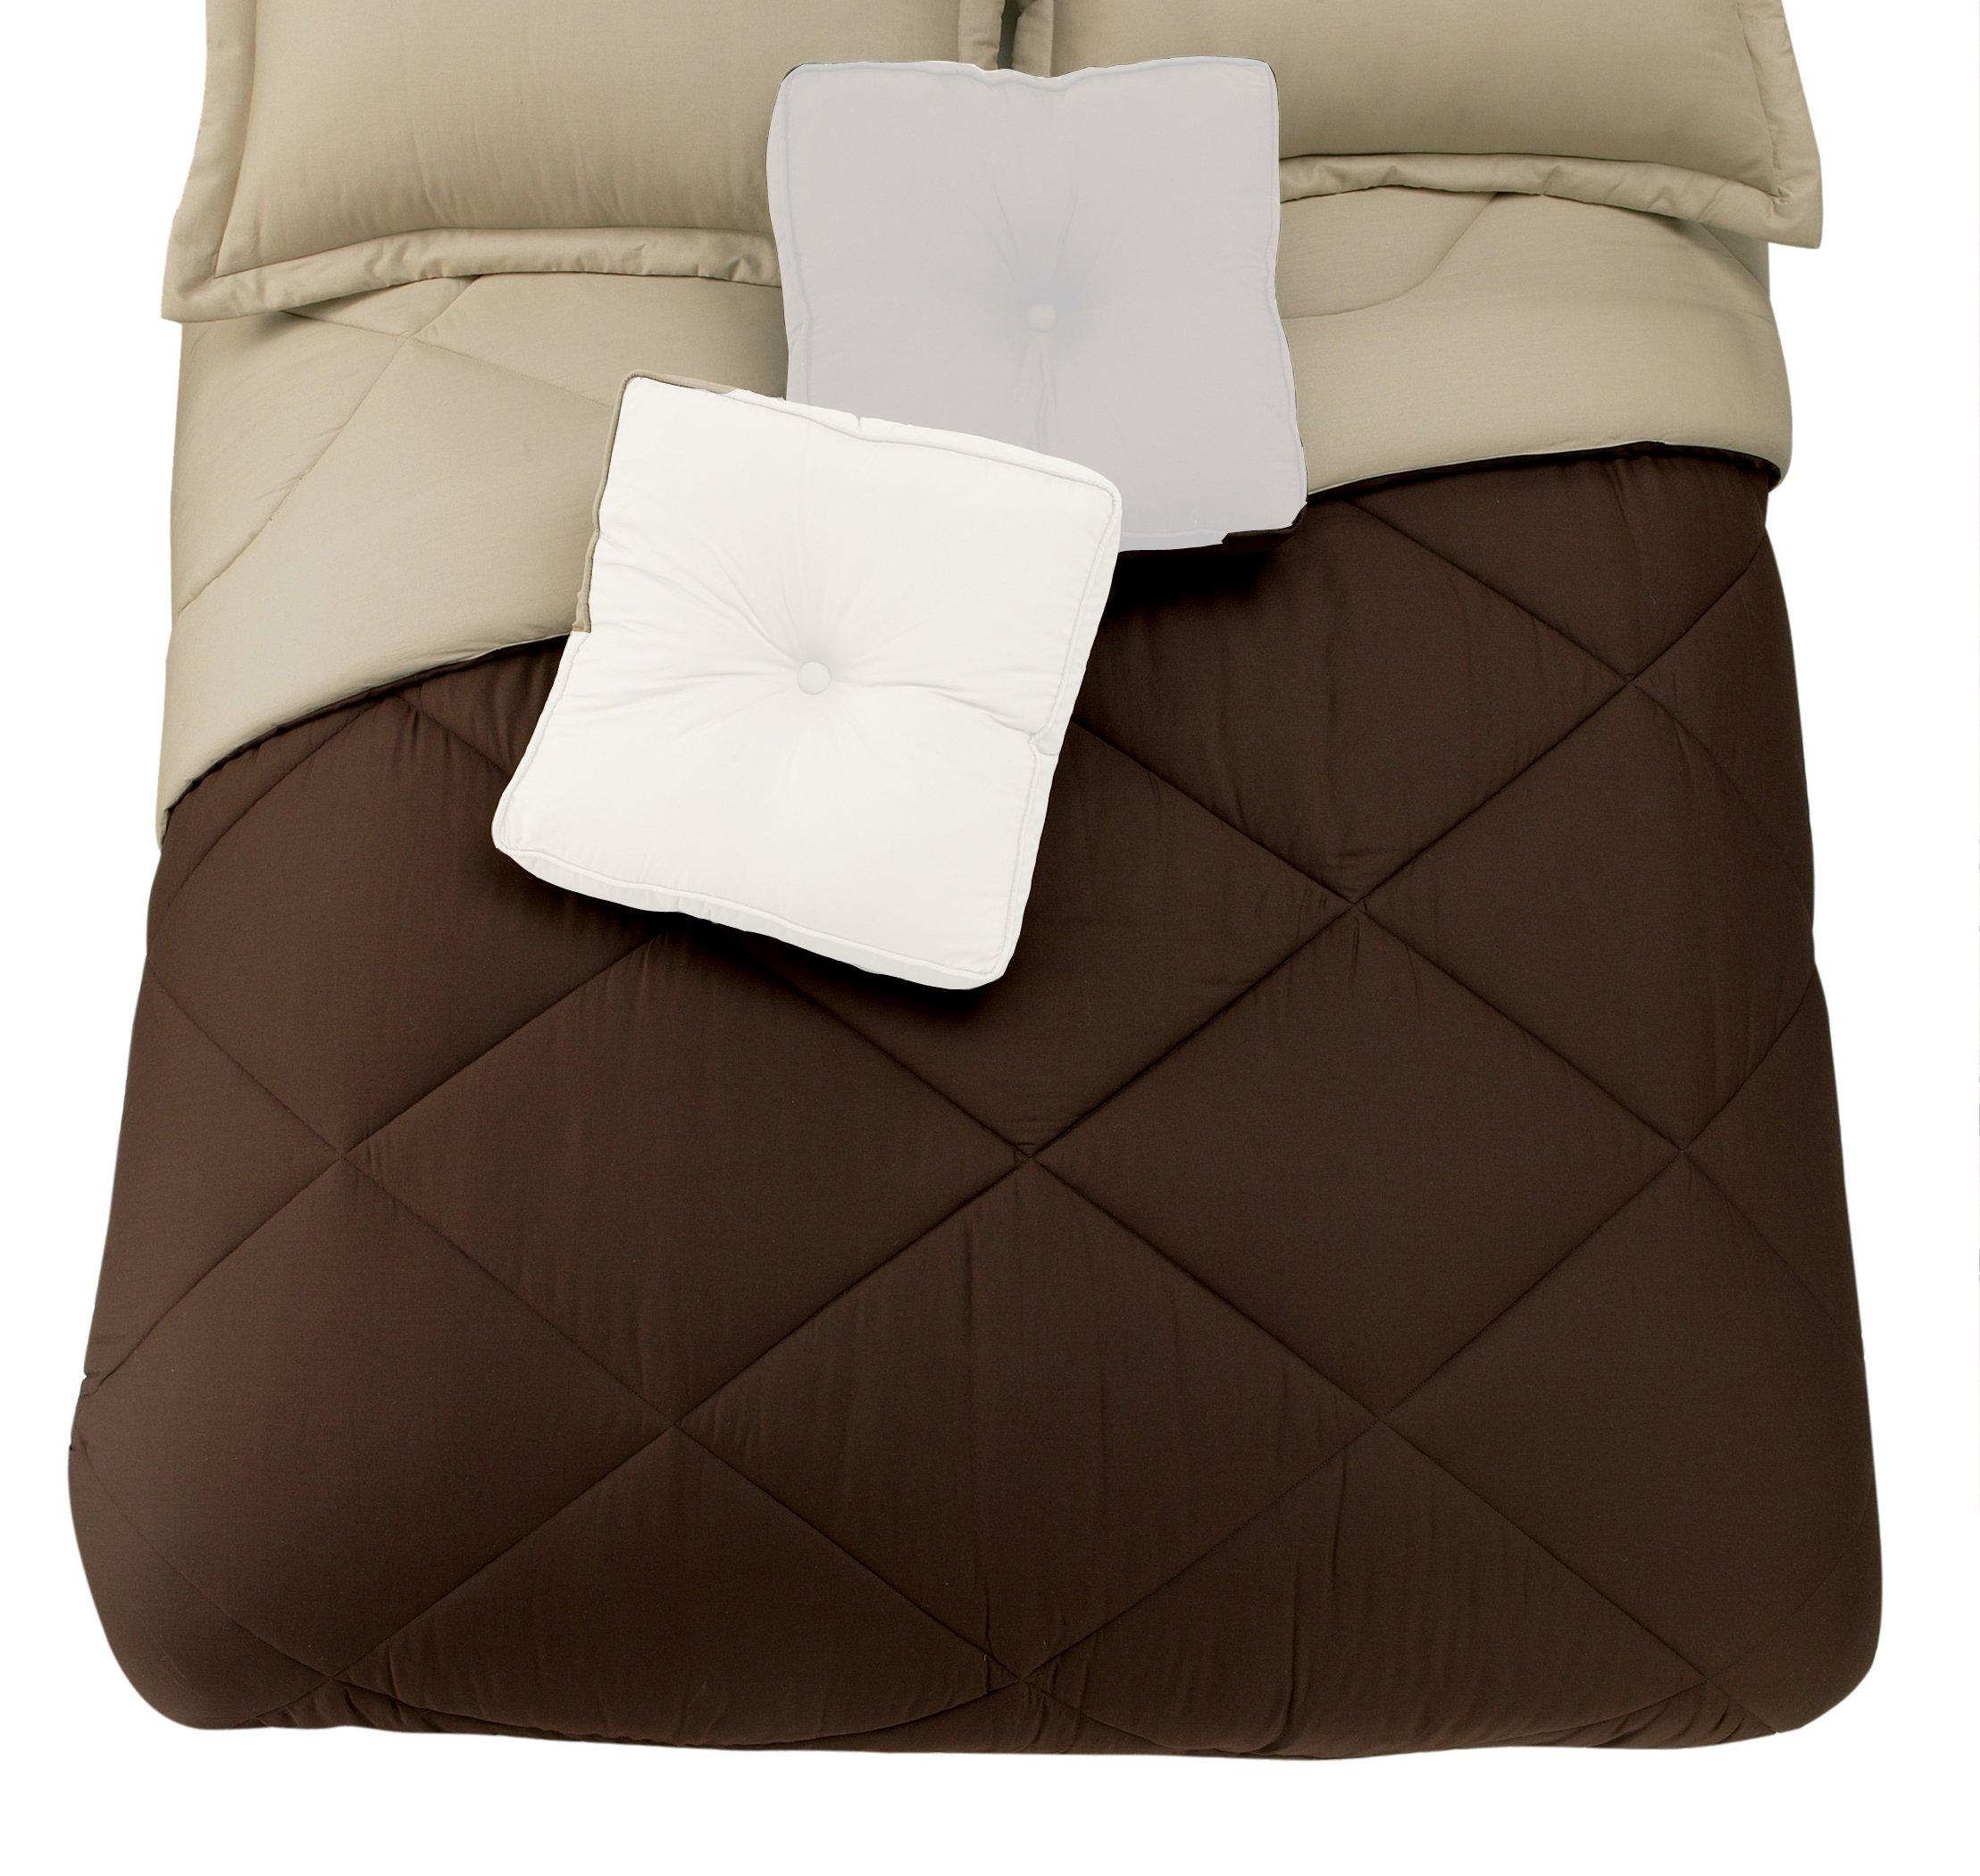 Presidio Square Collection Reversible Cotton Comforter, King, Brown/Linen